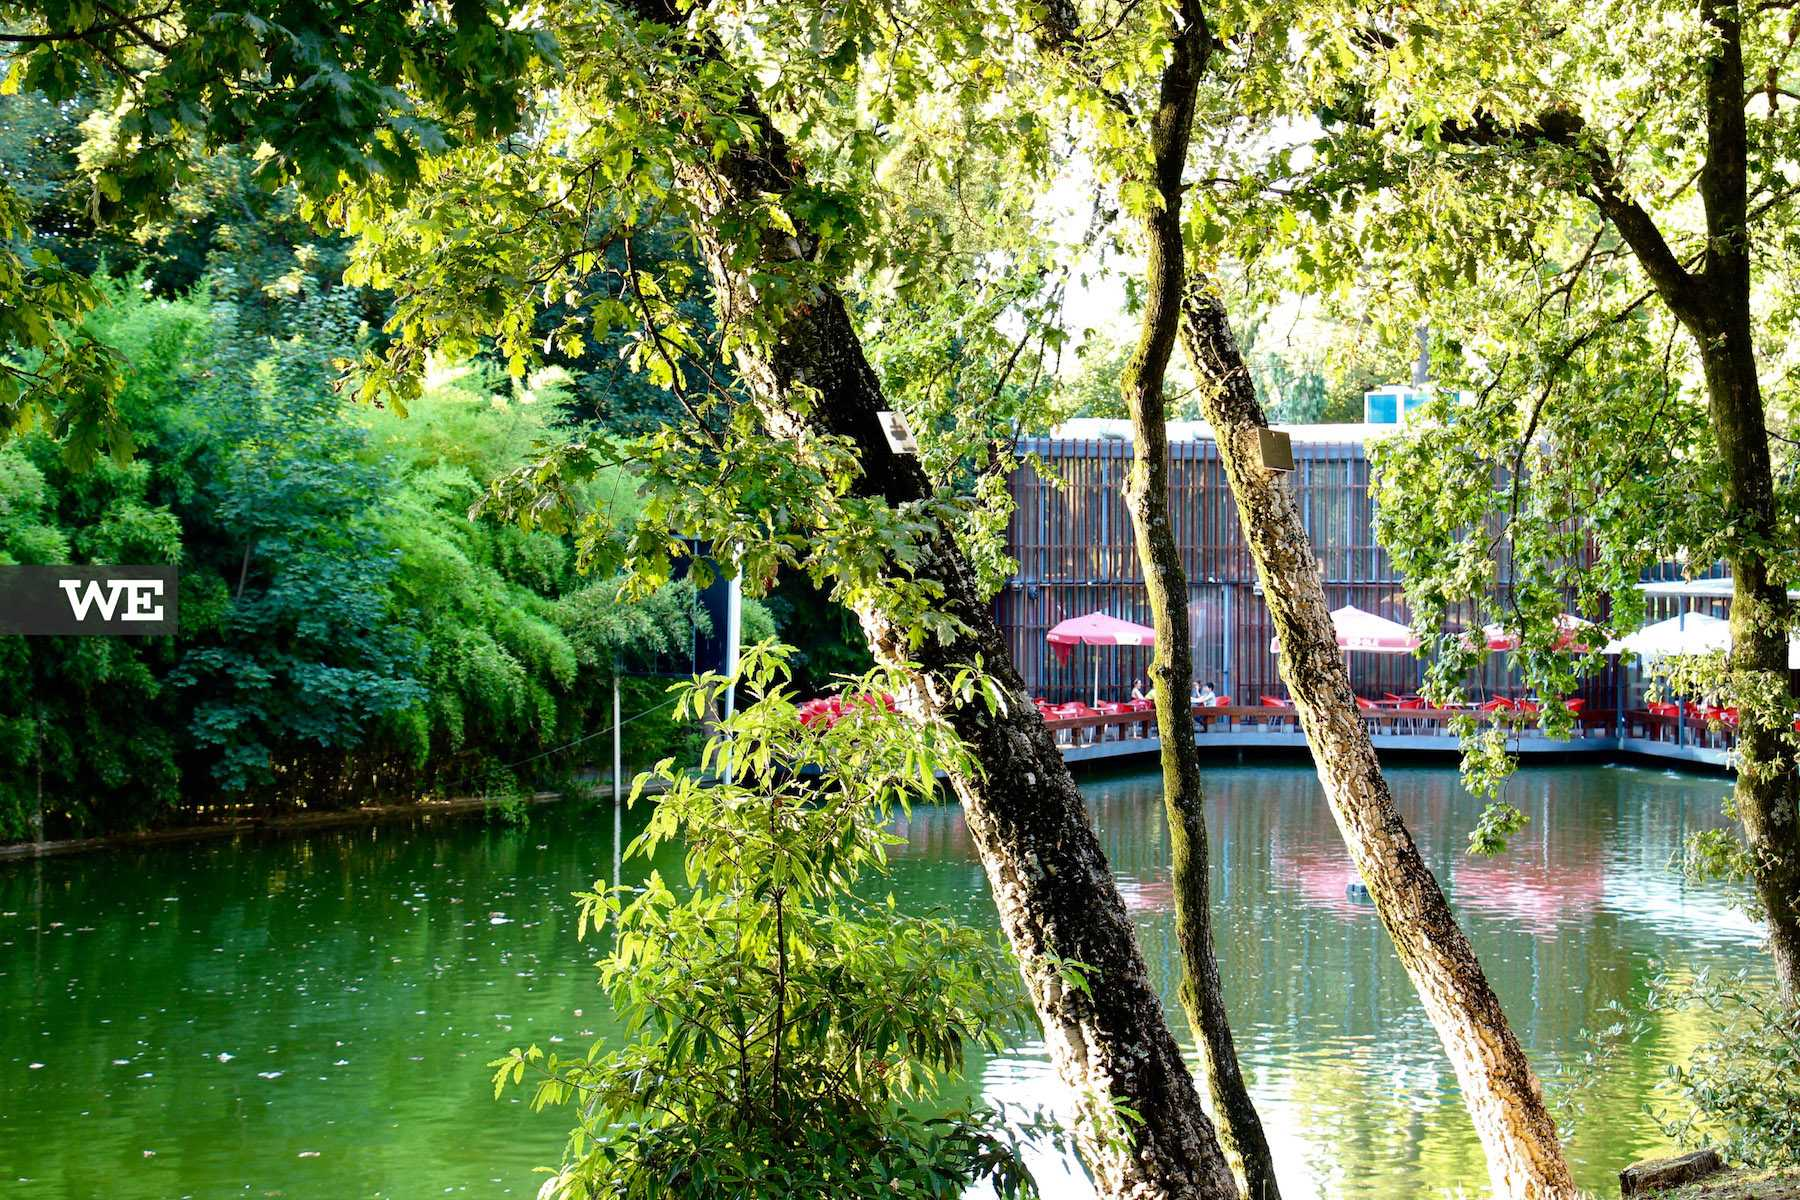 we-braga-parque-da-ponte-o-lago-esplanada